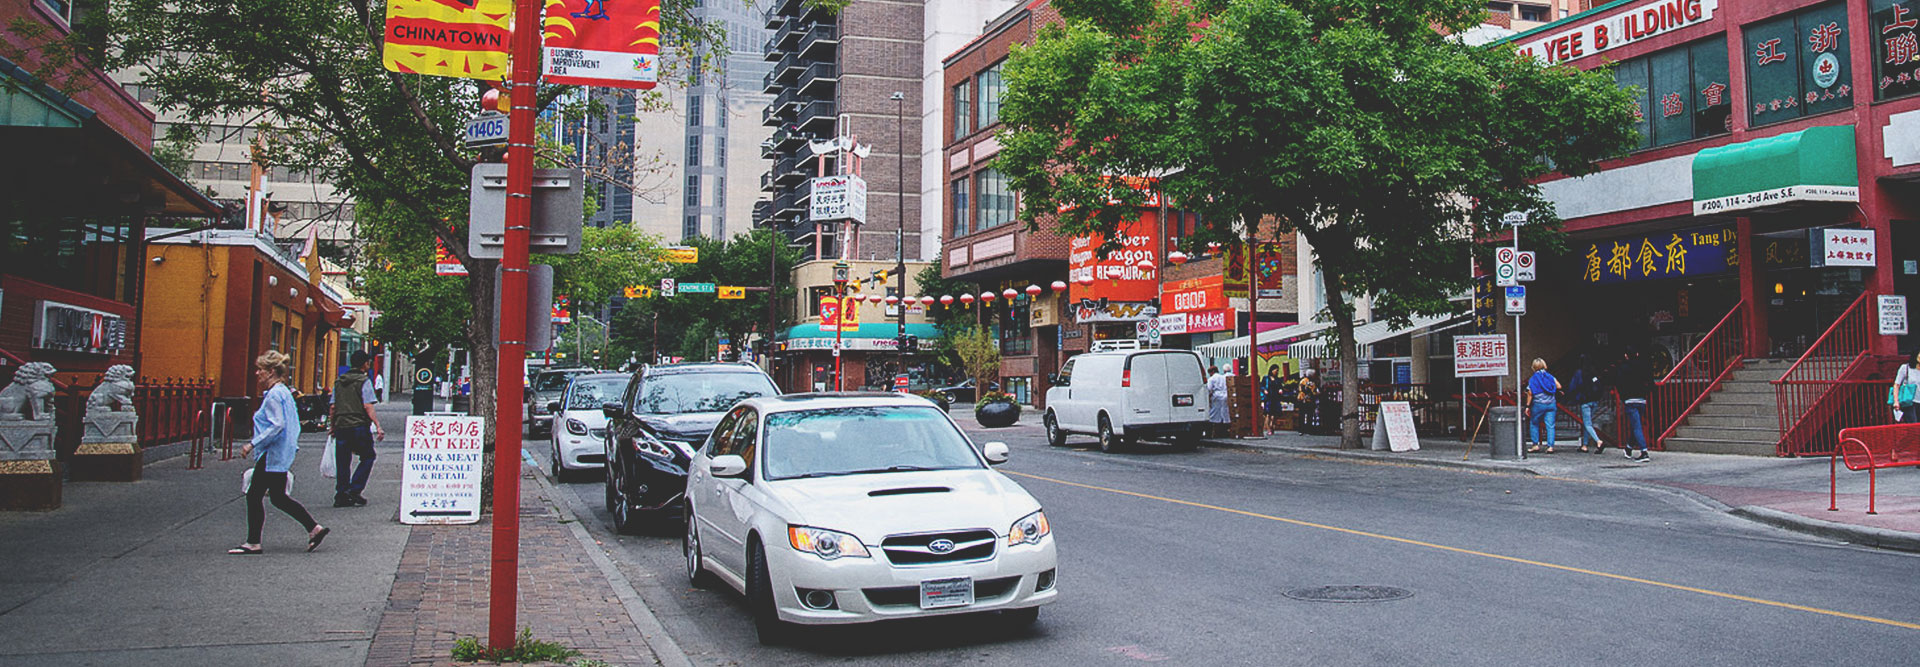 Getting Around Calgary Tourism Calgary